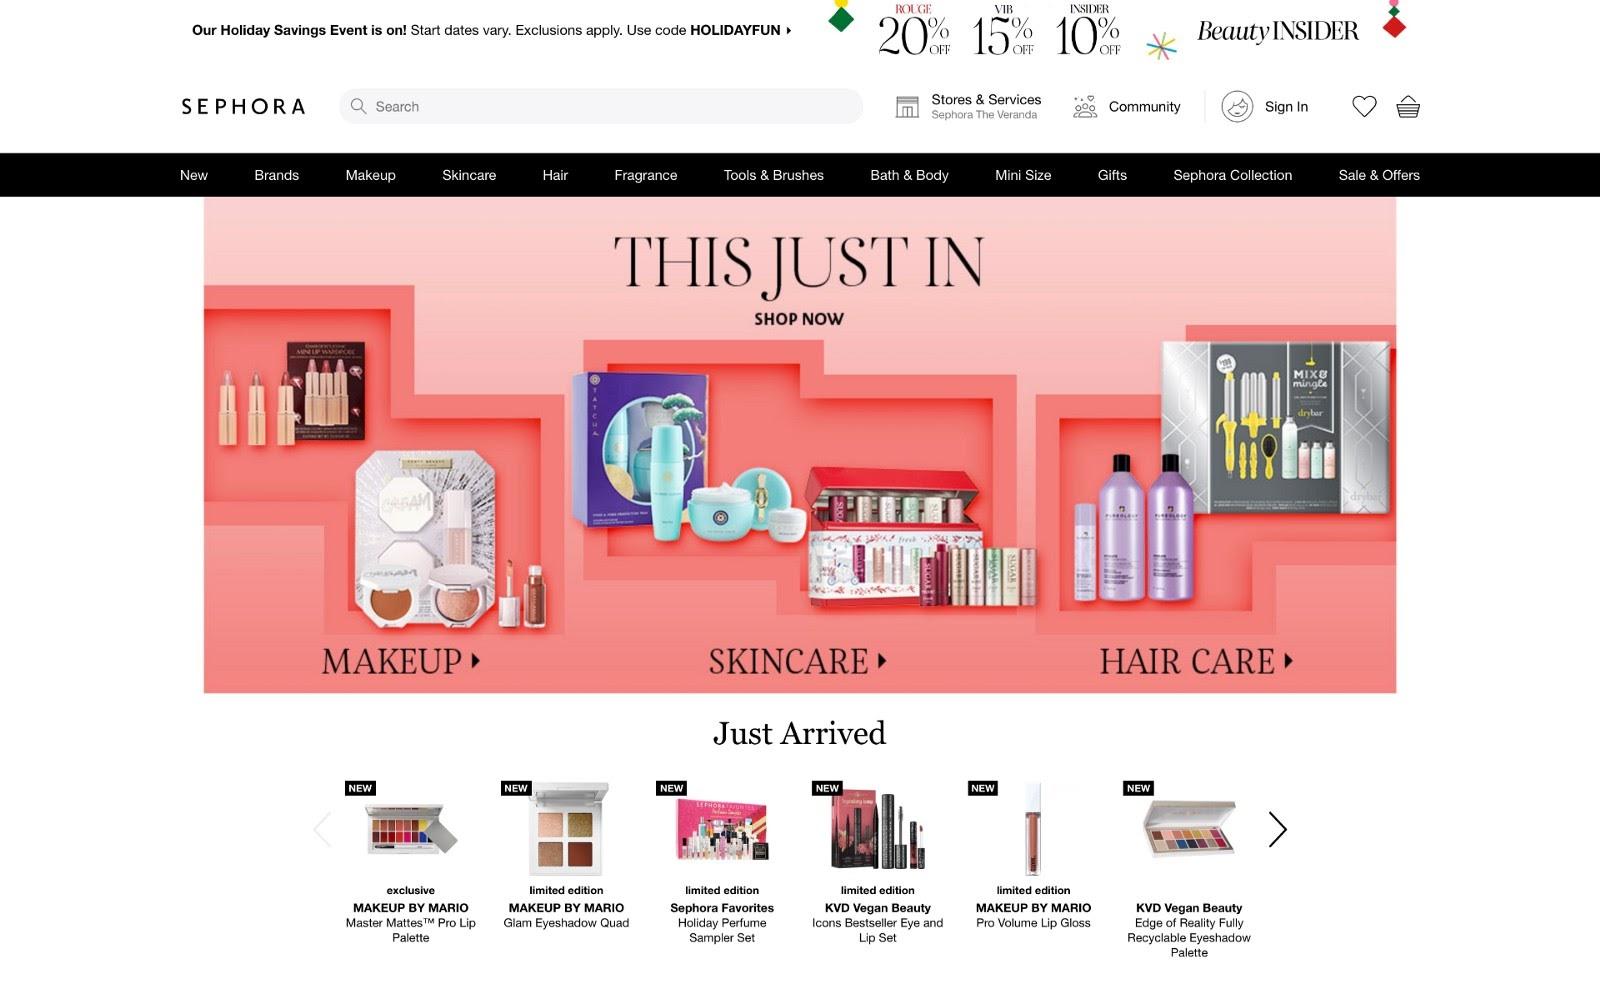 Example of an eCommerce website (sephora.com)